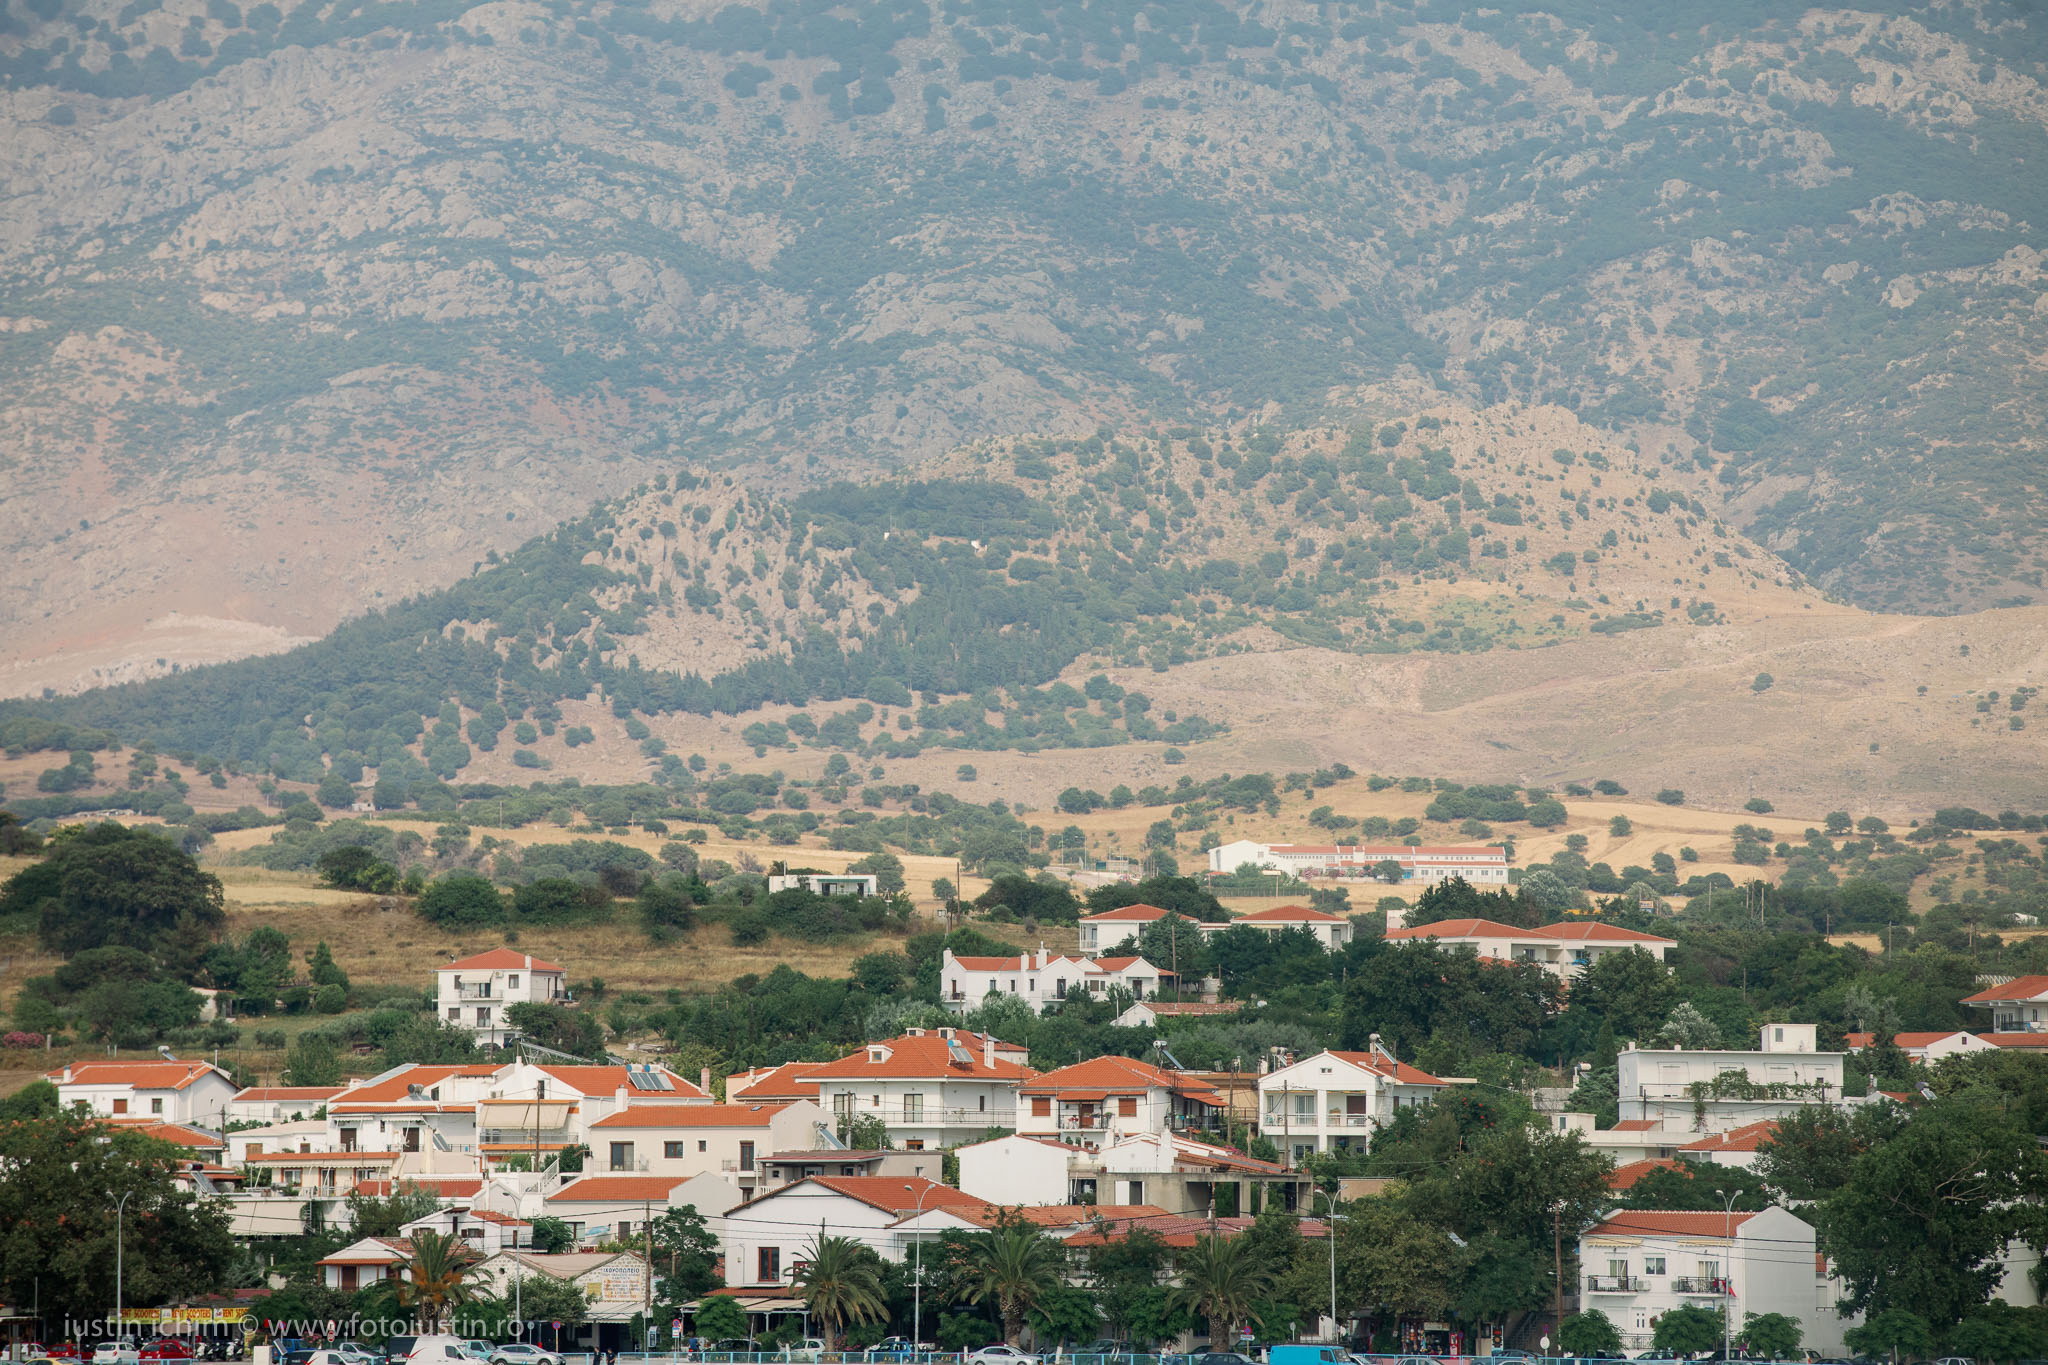 Samothraki, Samothrace